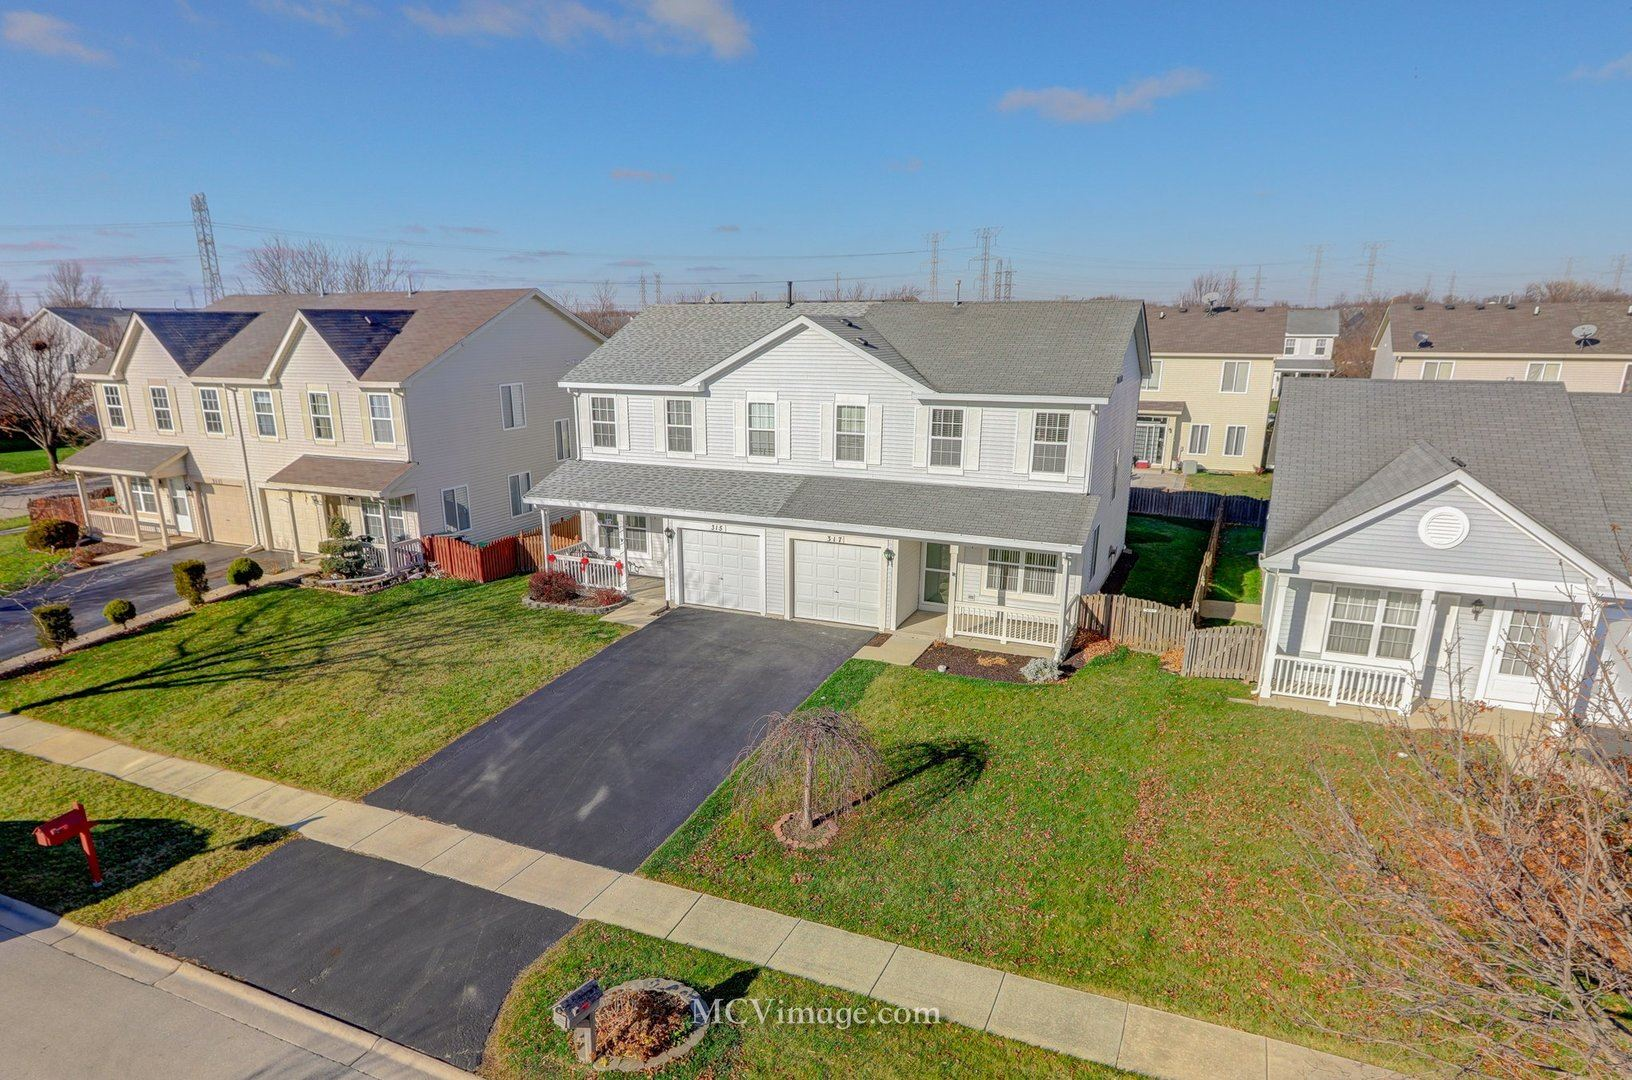 Photo of 317 Reston Circle, Romeoville, IL 60446 (MLS # 11044987)